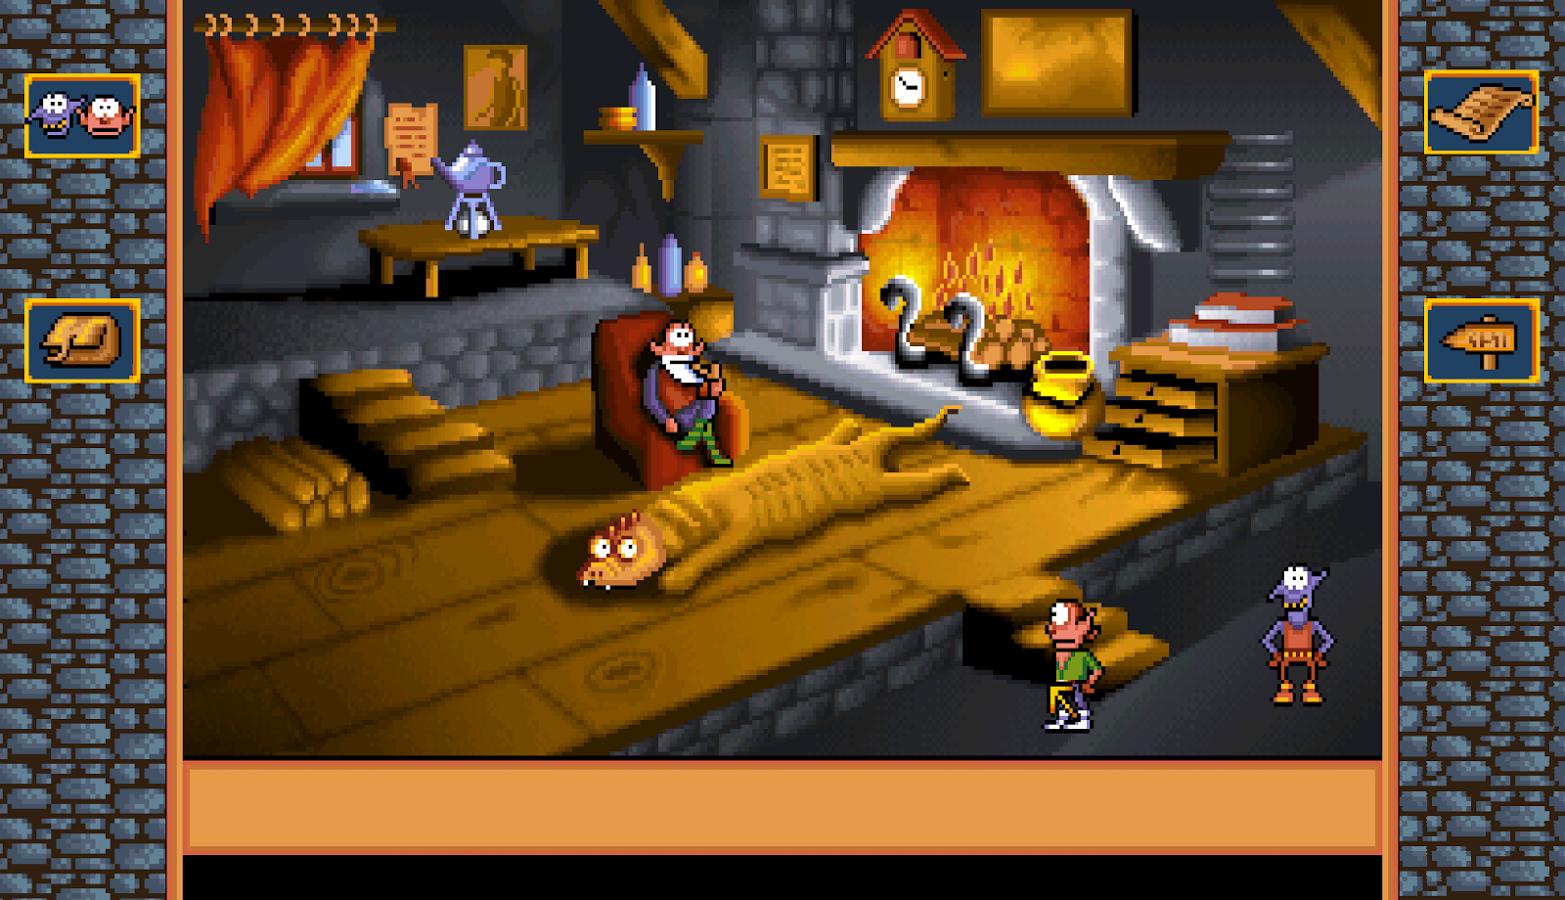 [New Game] DotEmu Resurrects Classic Gobliiins Adventure ...